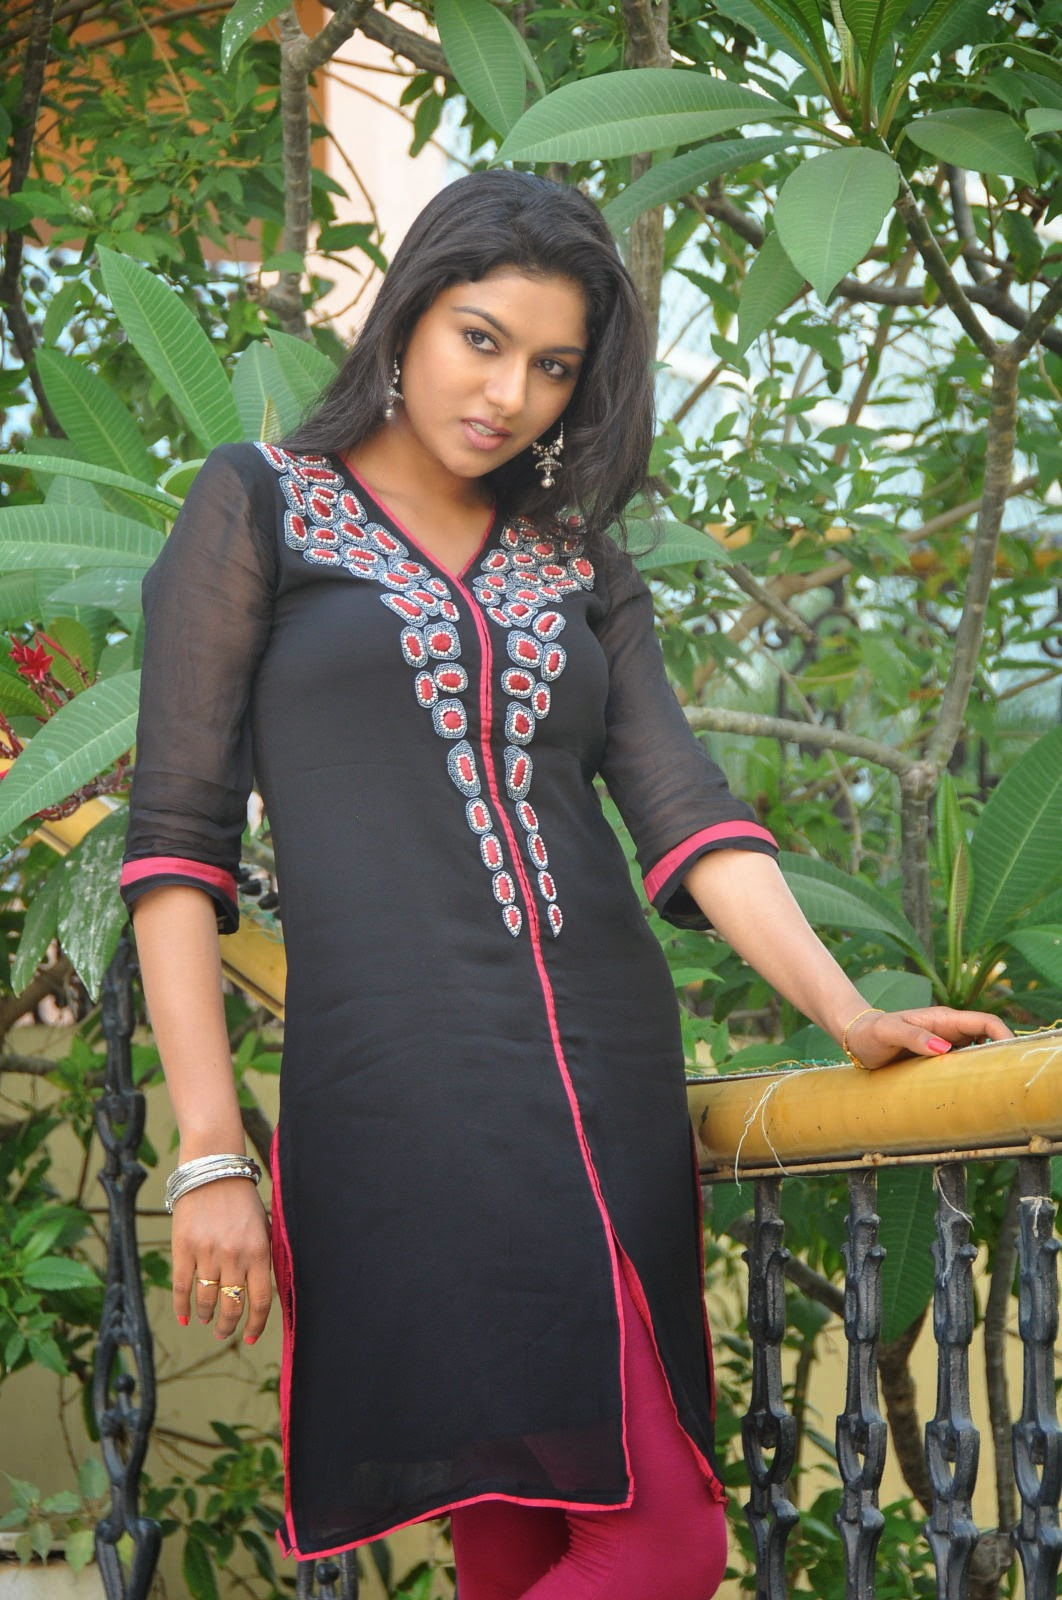 Akshaya glam photo shoot gallery-HQ-Photo-15